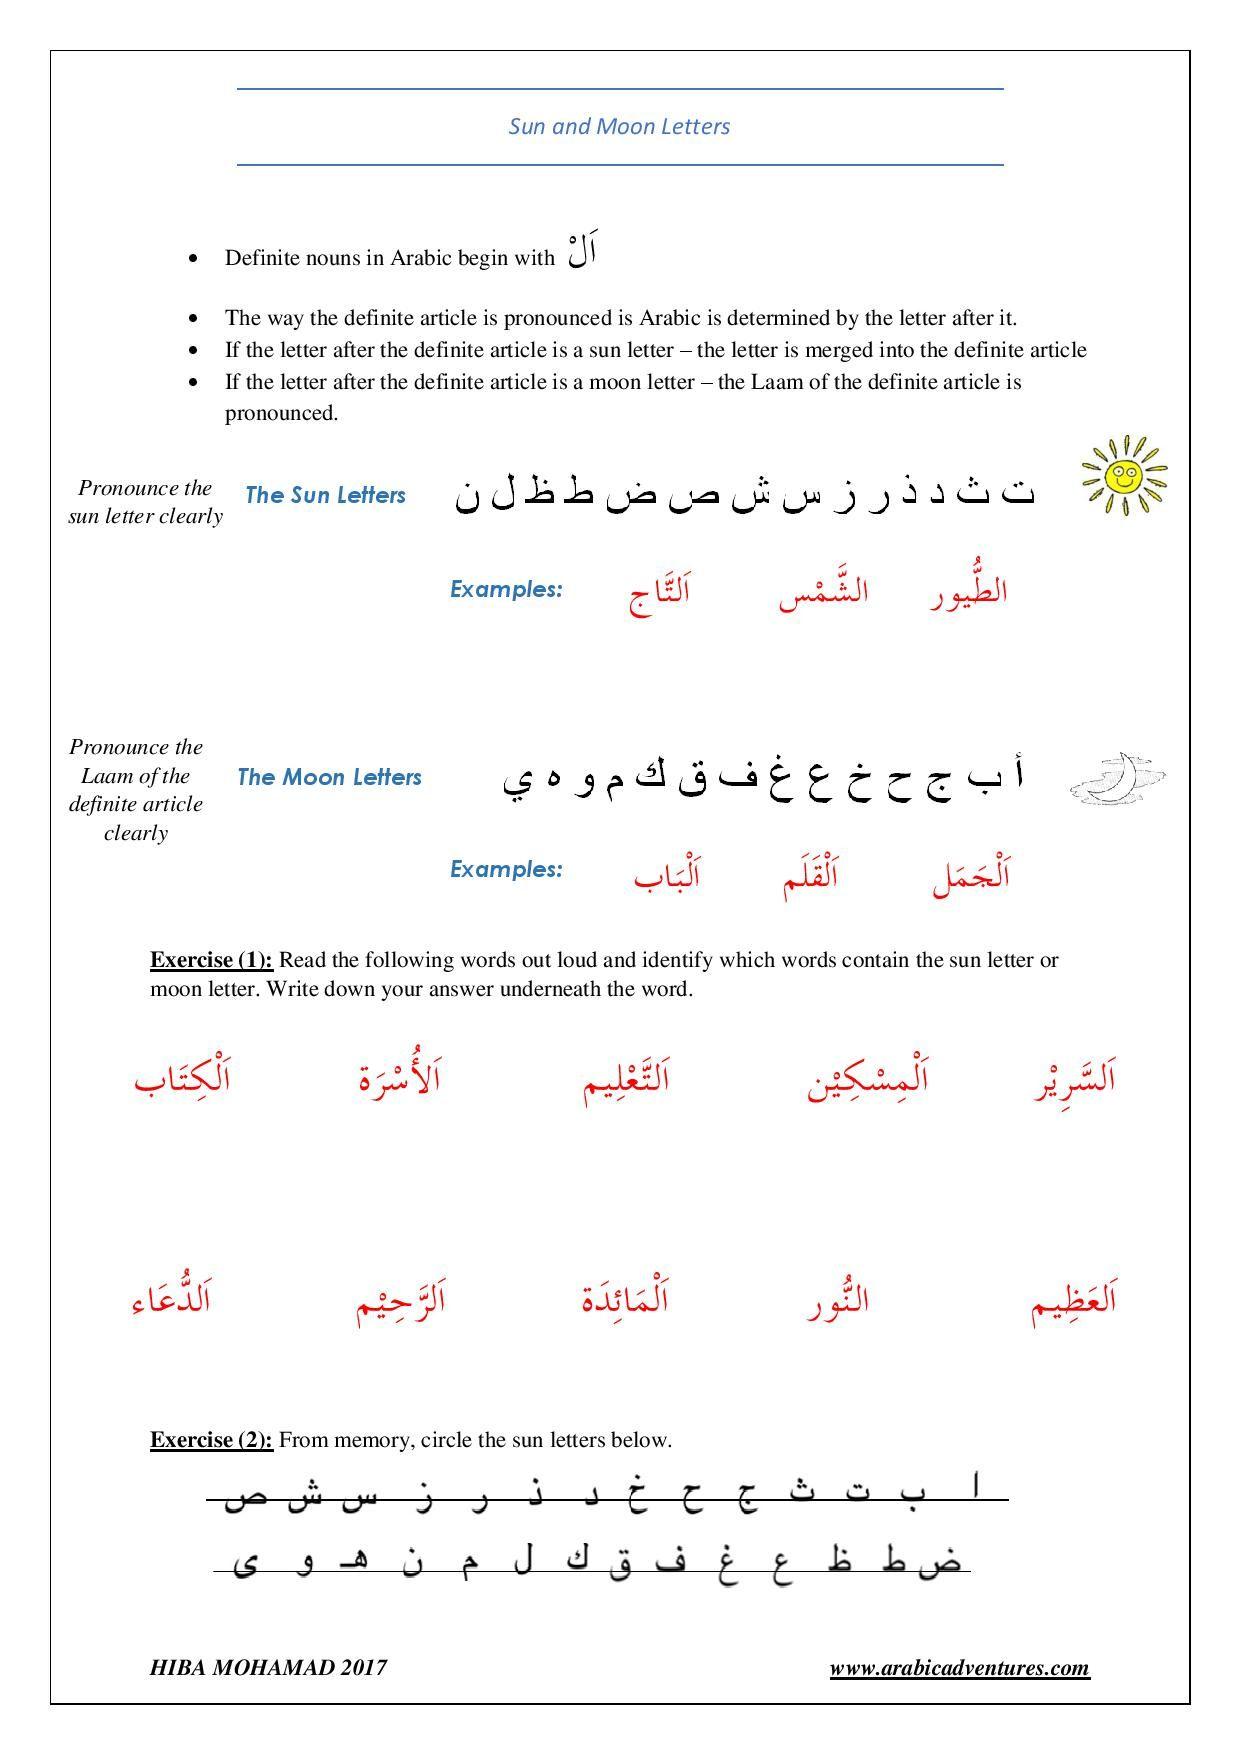 medium resolution of Learning Arabic MSA (#FabienneM) Sun and Moon letters in Arabic worksheet  www.arabicadventures.com   Learning arabic